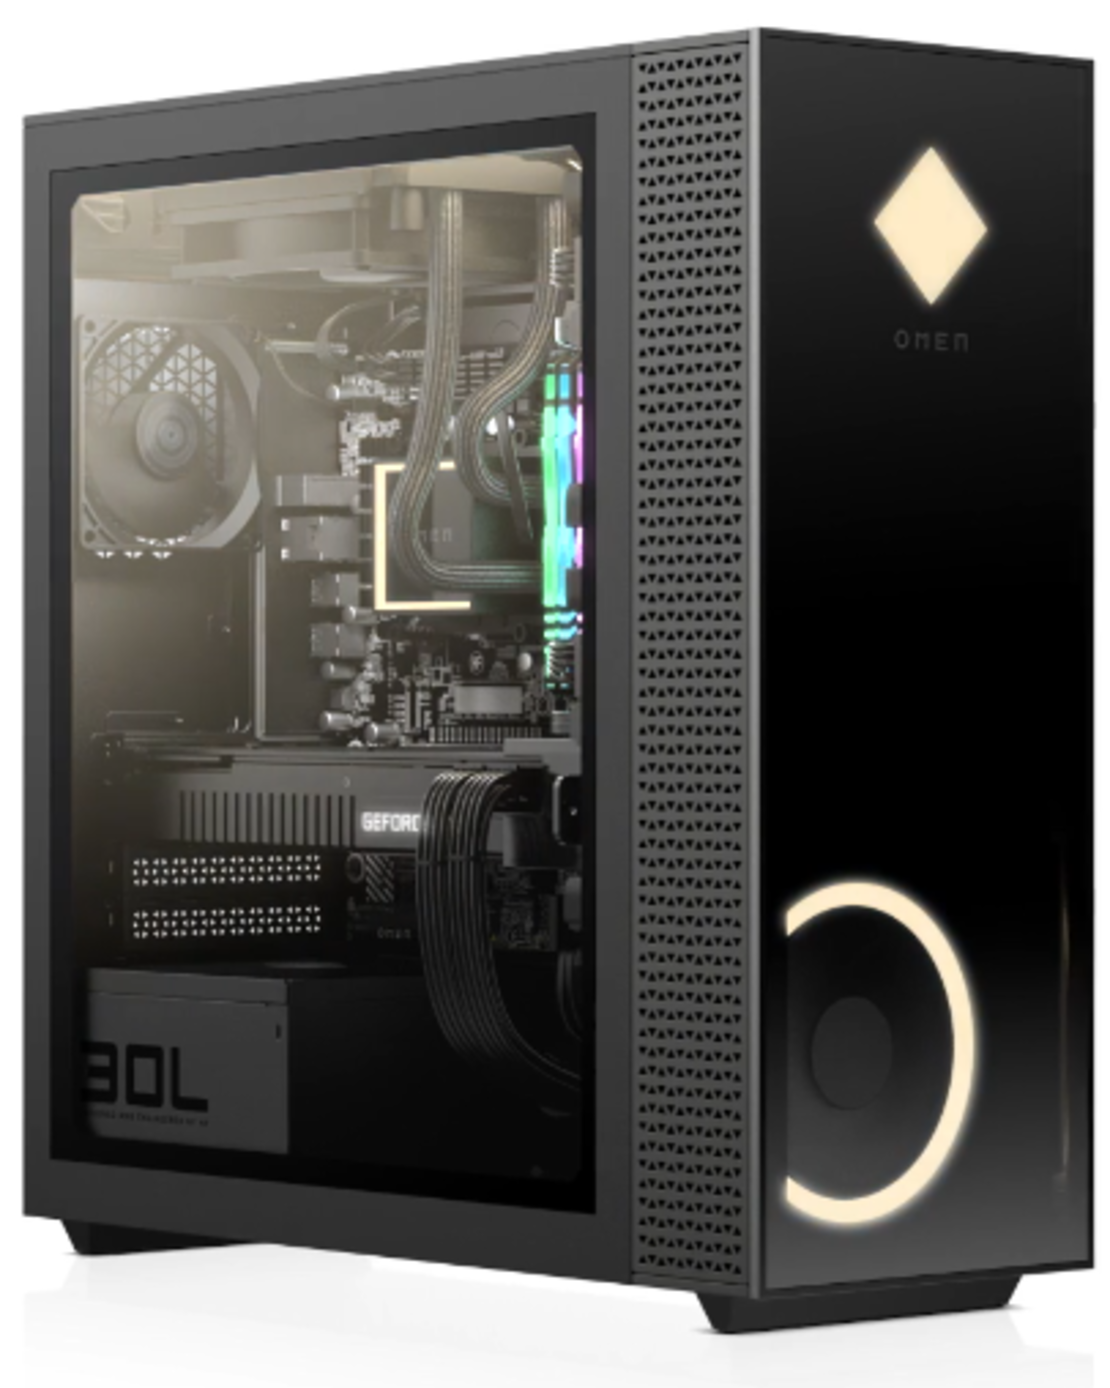 מחשב גיימינג HP OMEN GT13-0006nj/i7-10700K/32GB/1TB SSD NVMe/RTX 3080 10GB